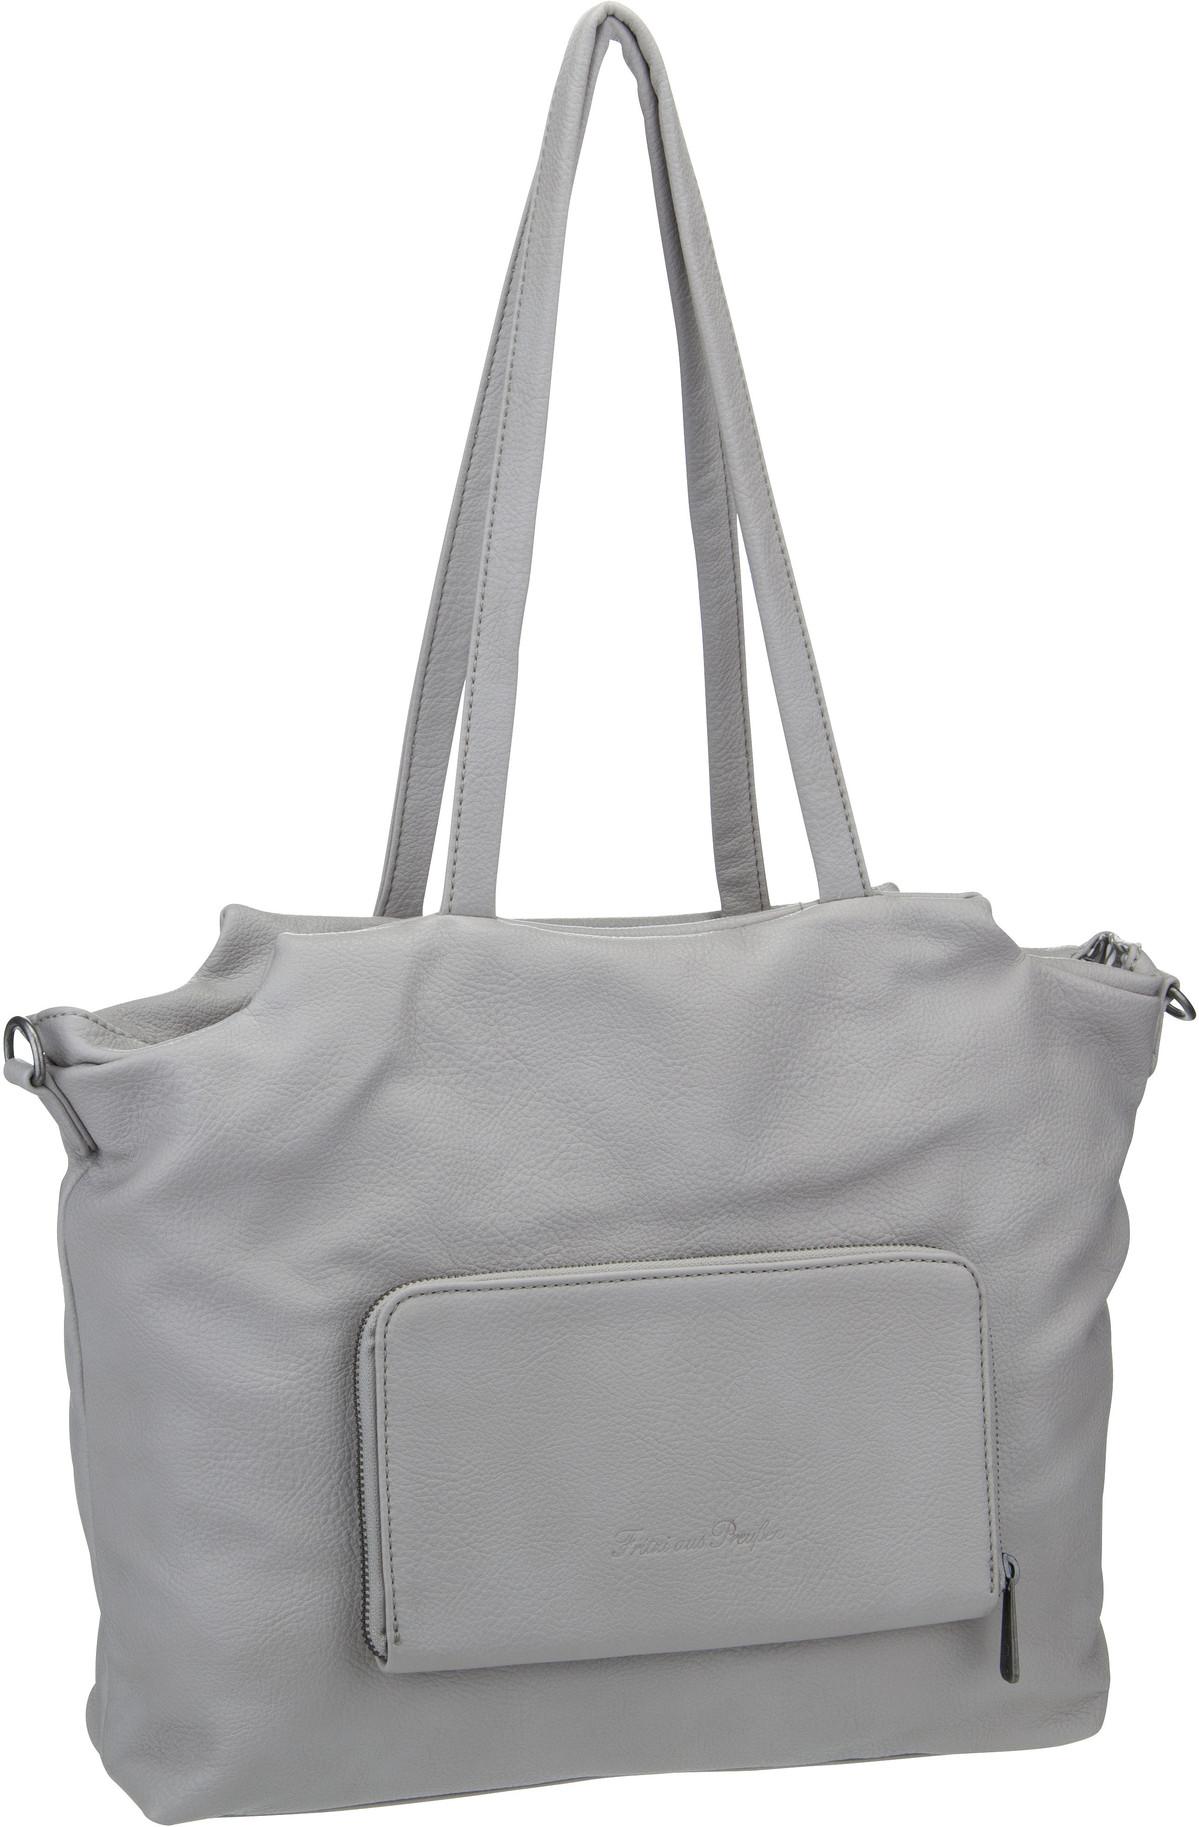 Handtasche Dala Super Grain Light Grey